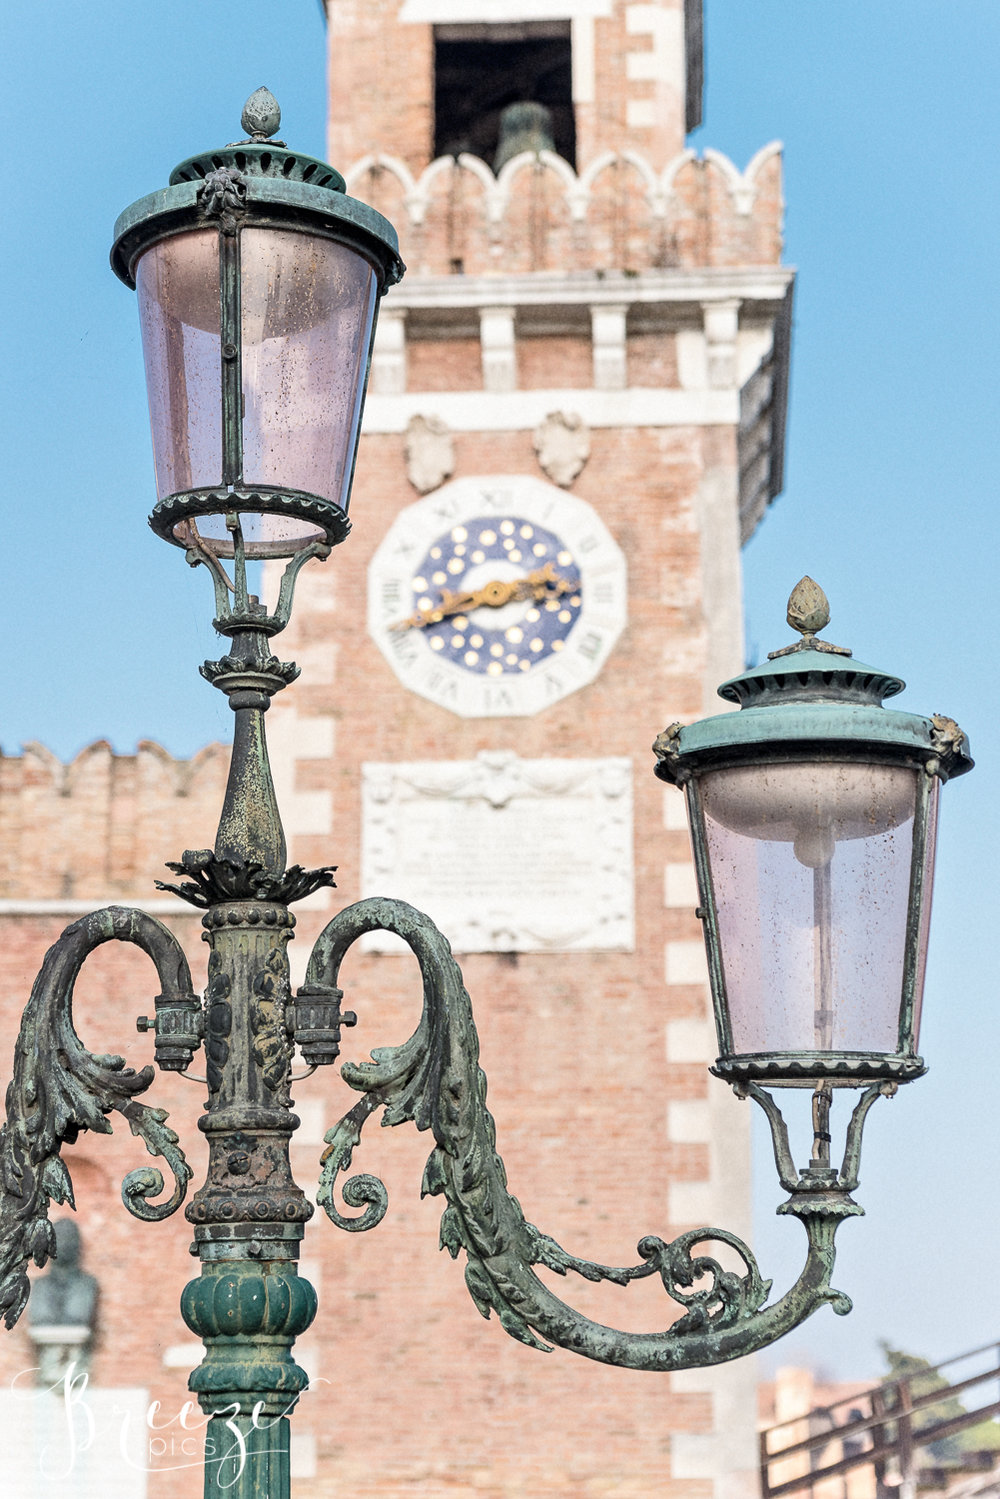 Venice_Details_Clock_Lamp.jpg